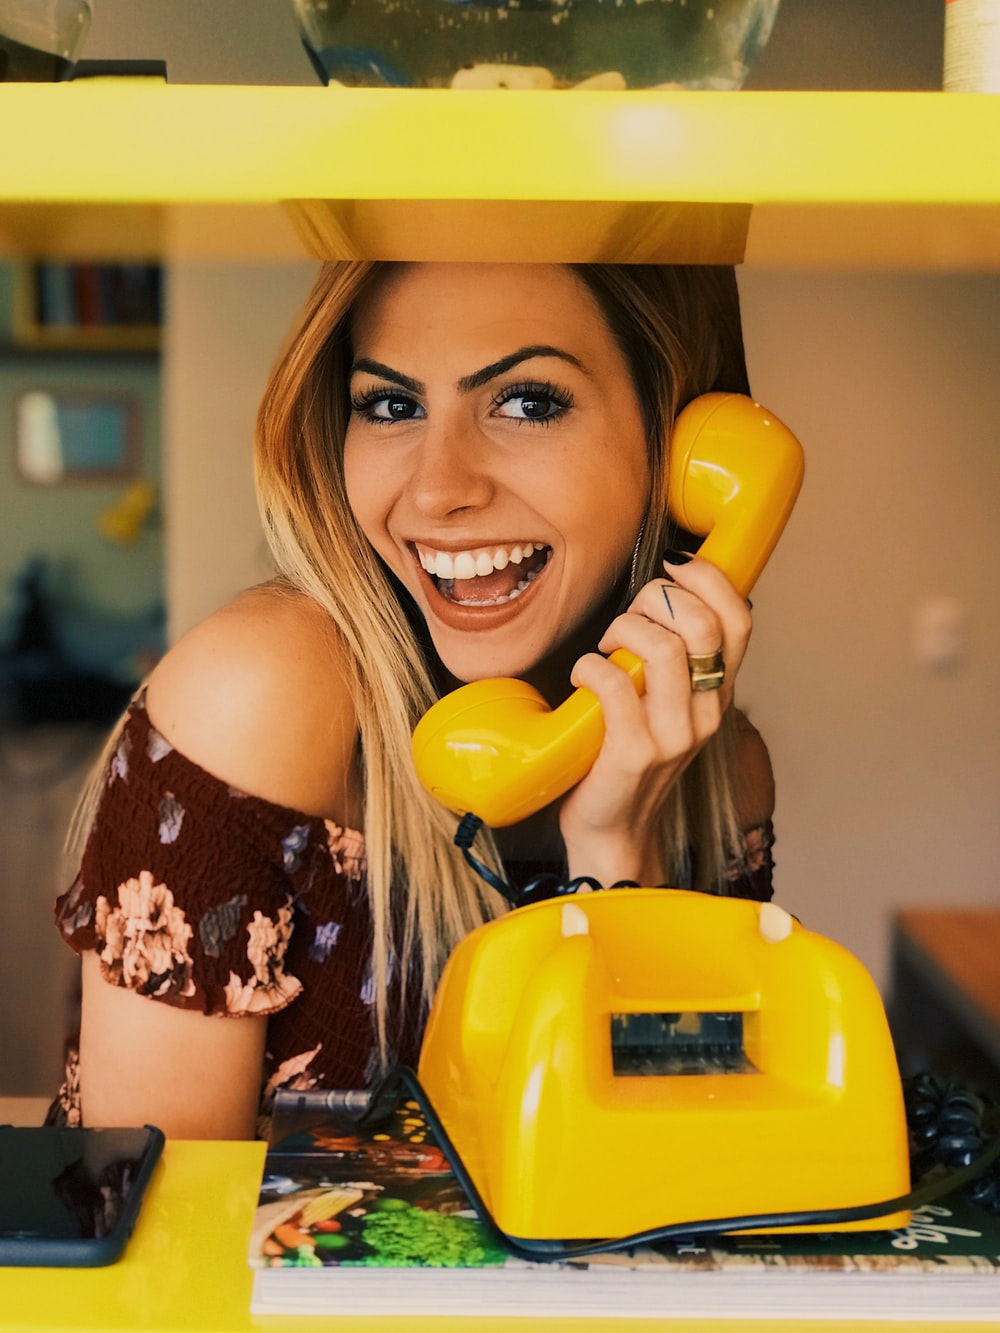 woman holding yellow rotary telephone